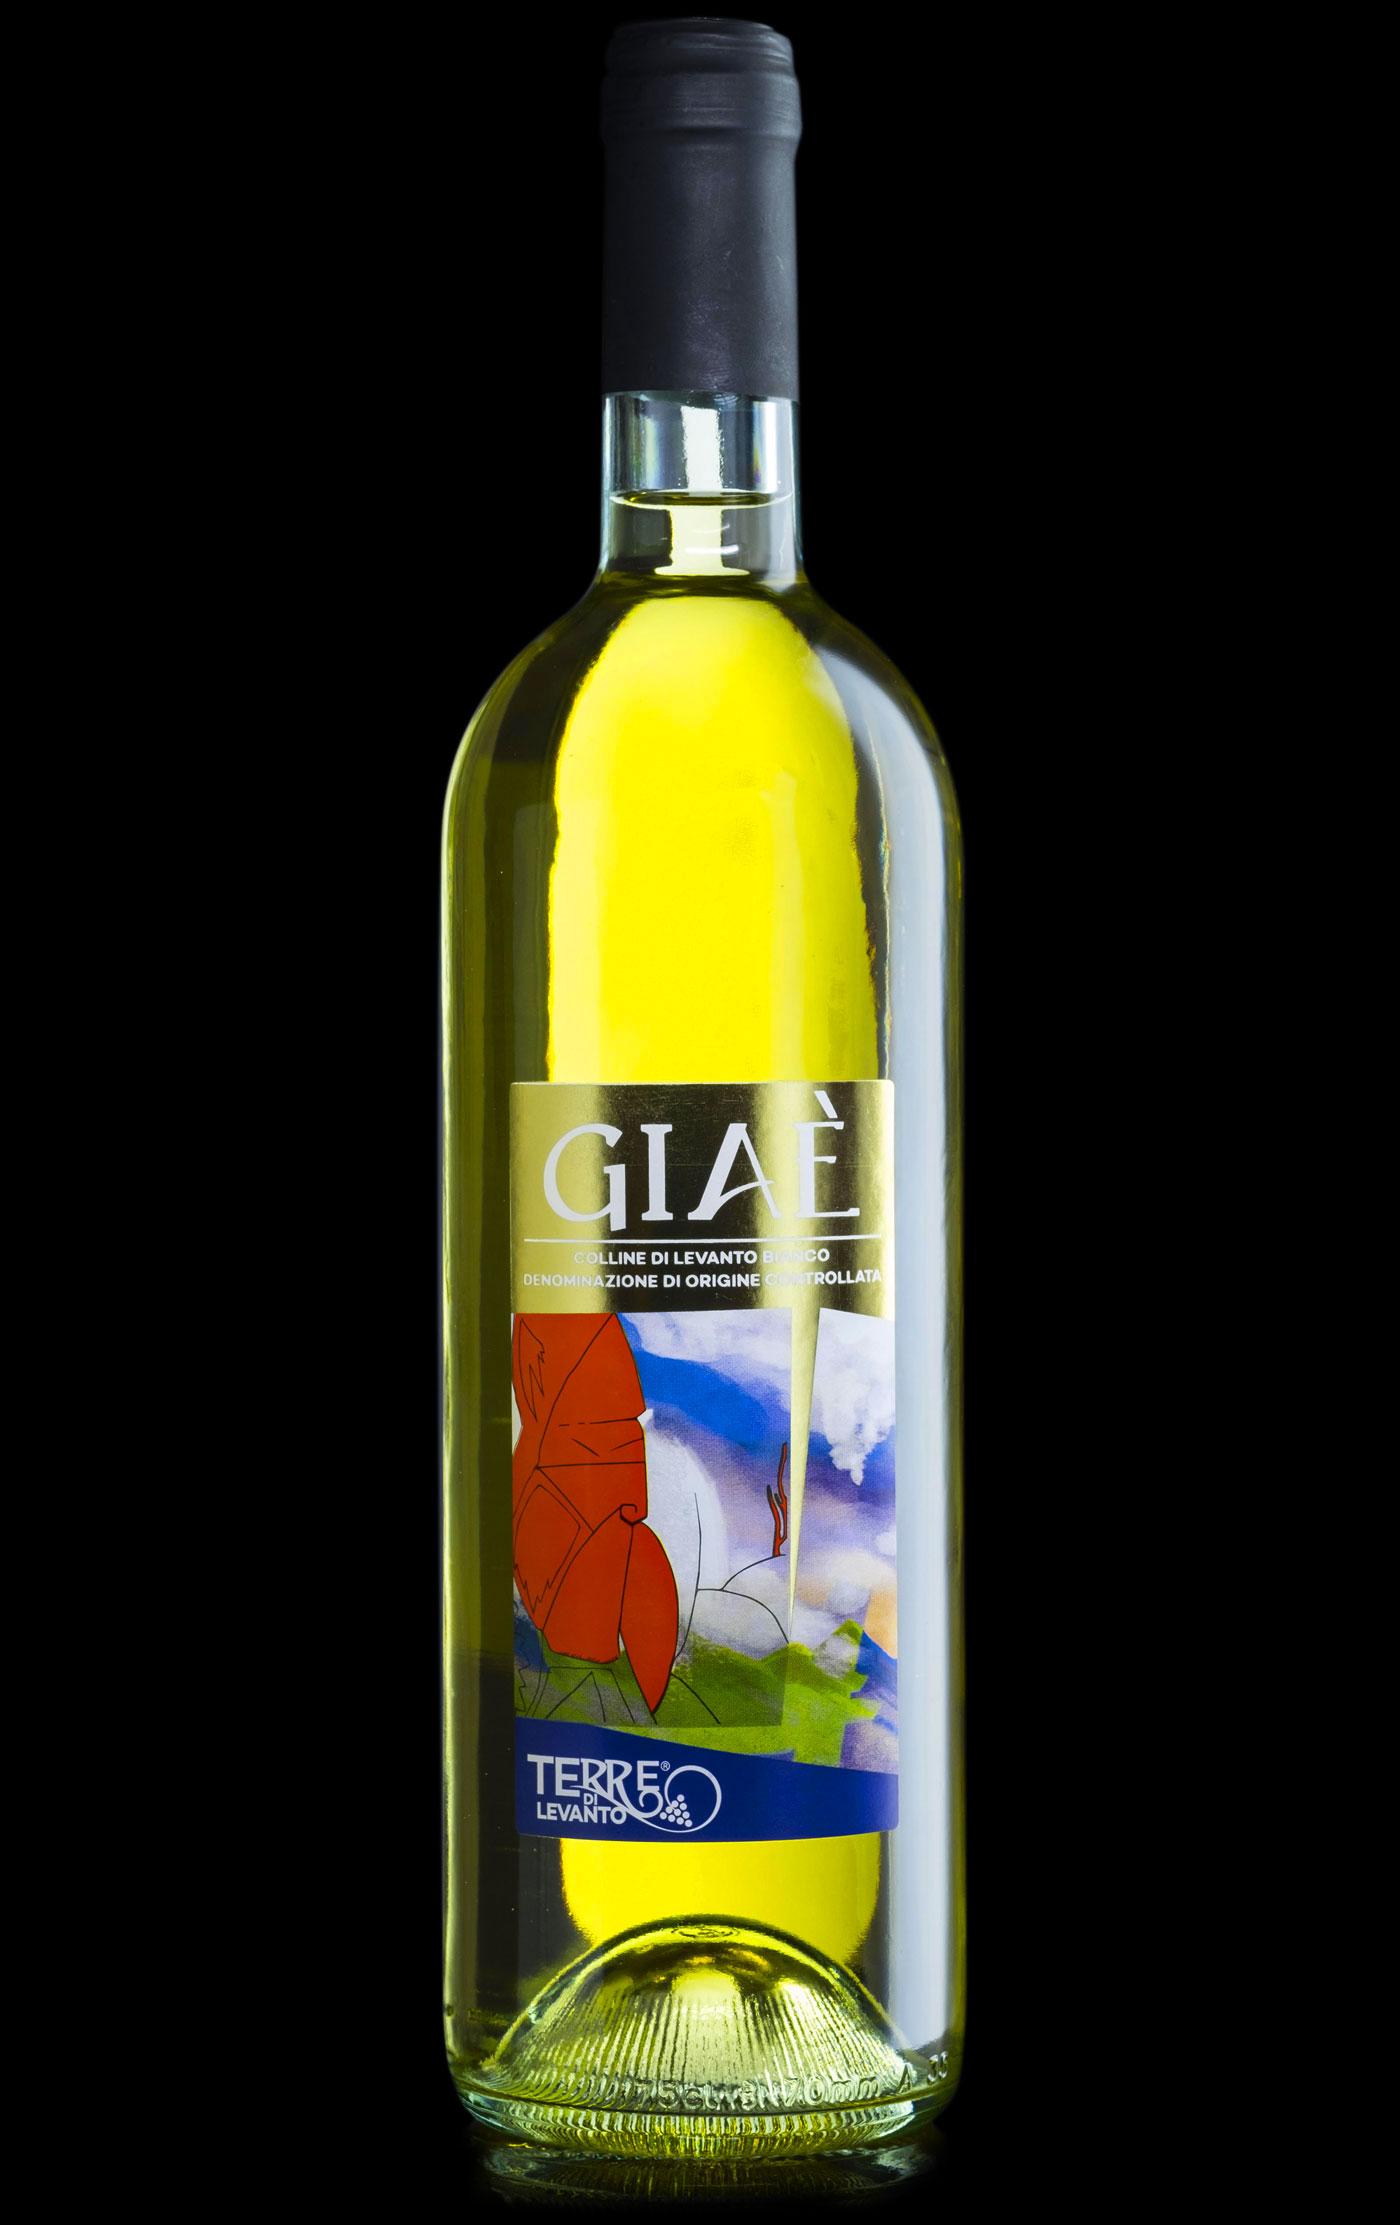 Giaè - Vino Bianco D.O.C.